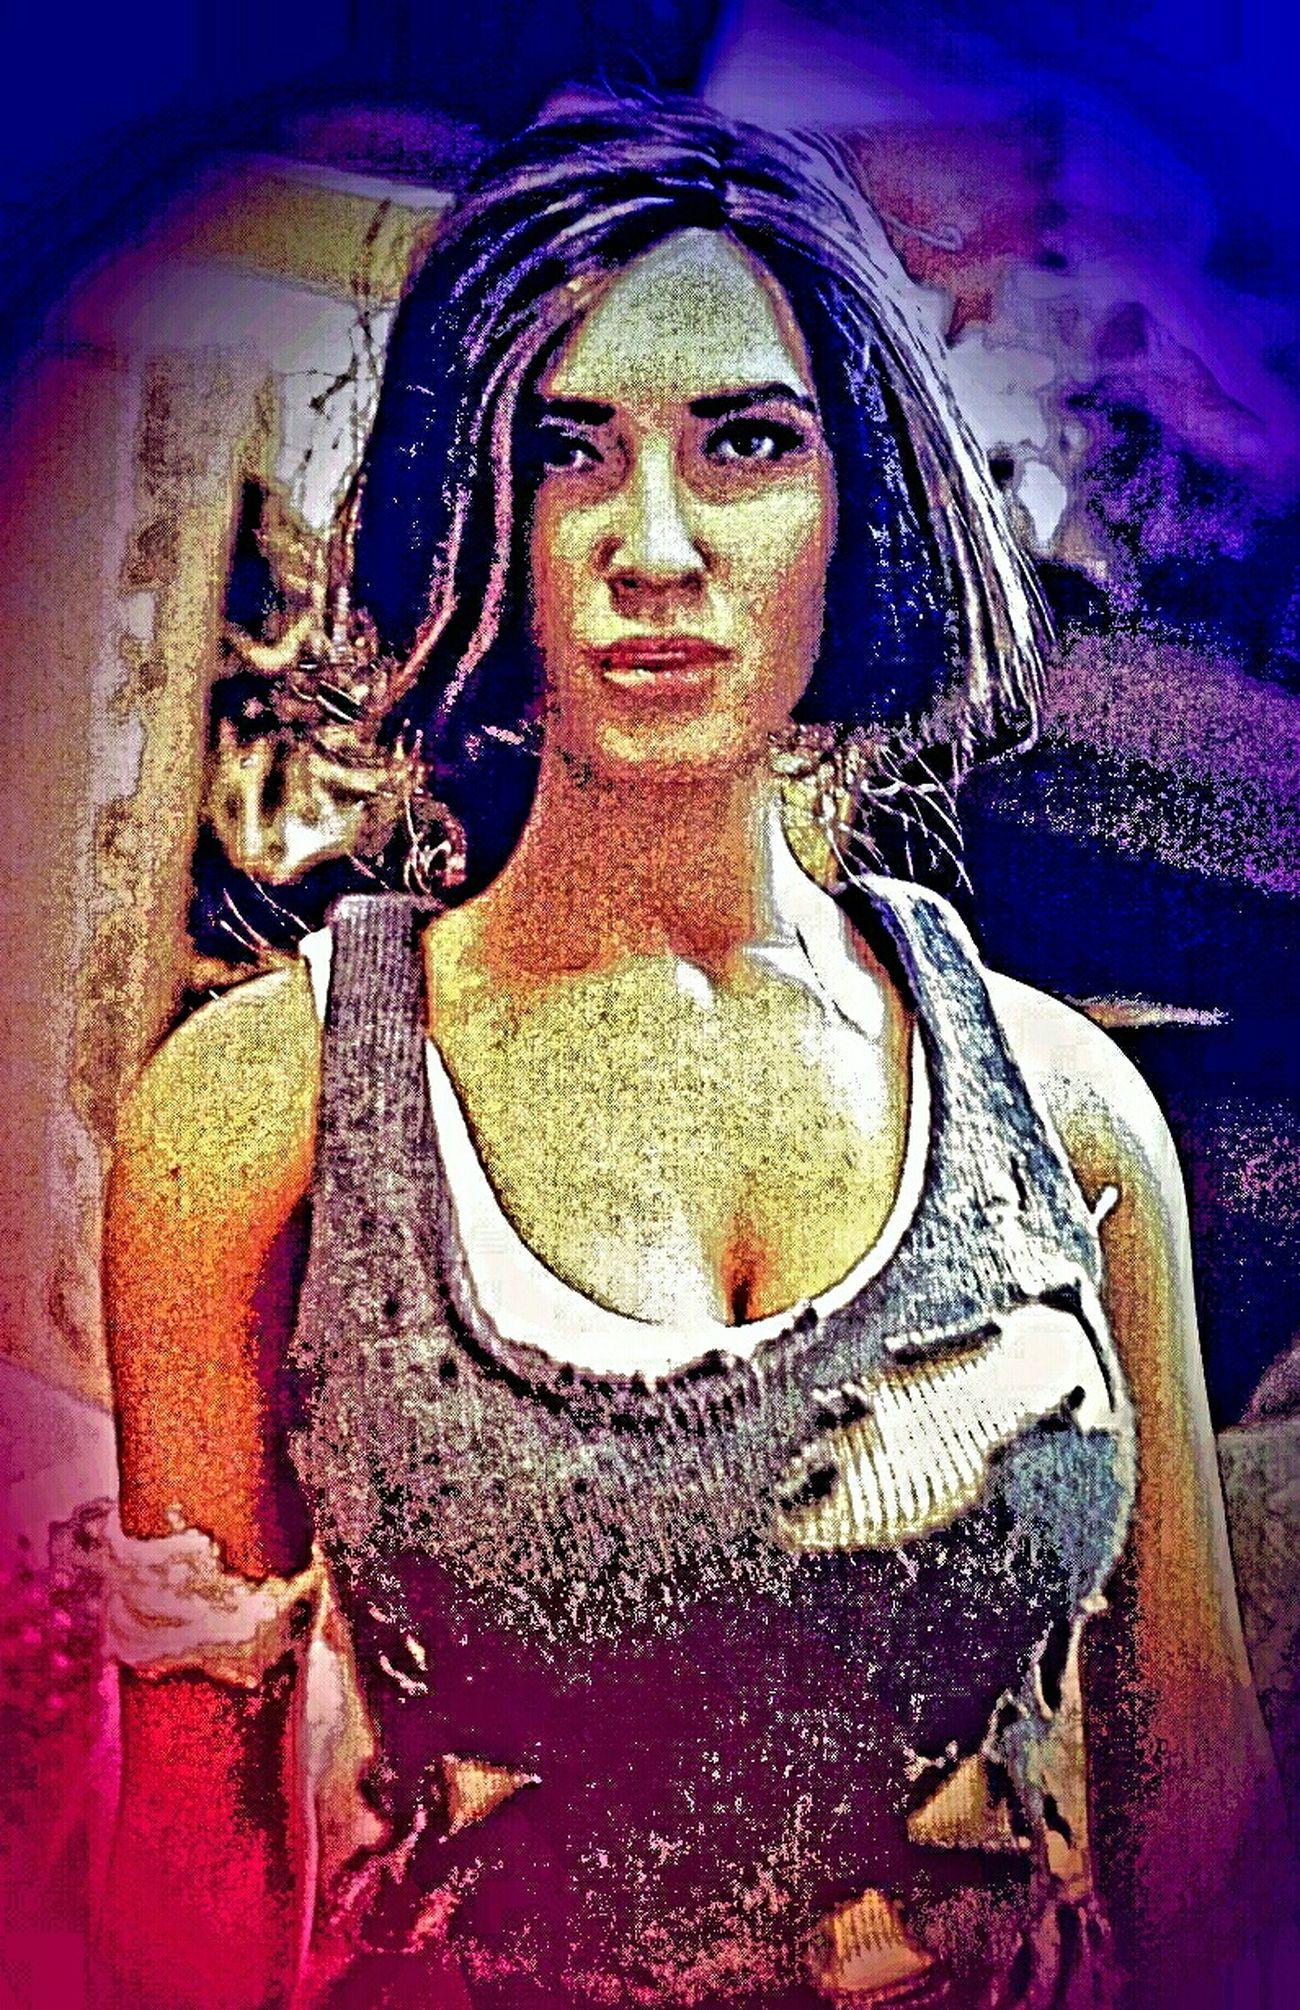 Survivor Lara Croft Tomb Raider  Videogames Onesixthscale Kitbash Mobilephotography Heroine Colour Portrait